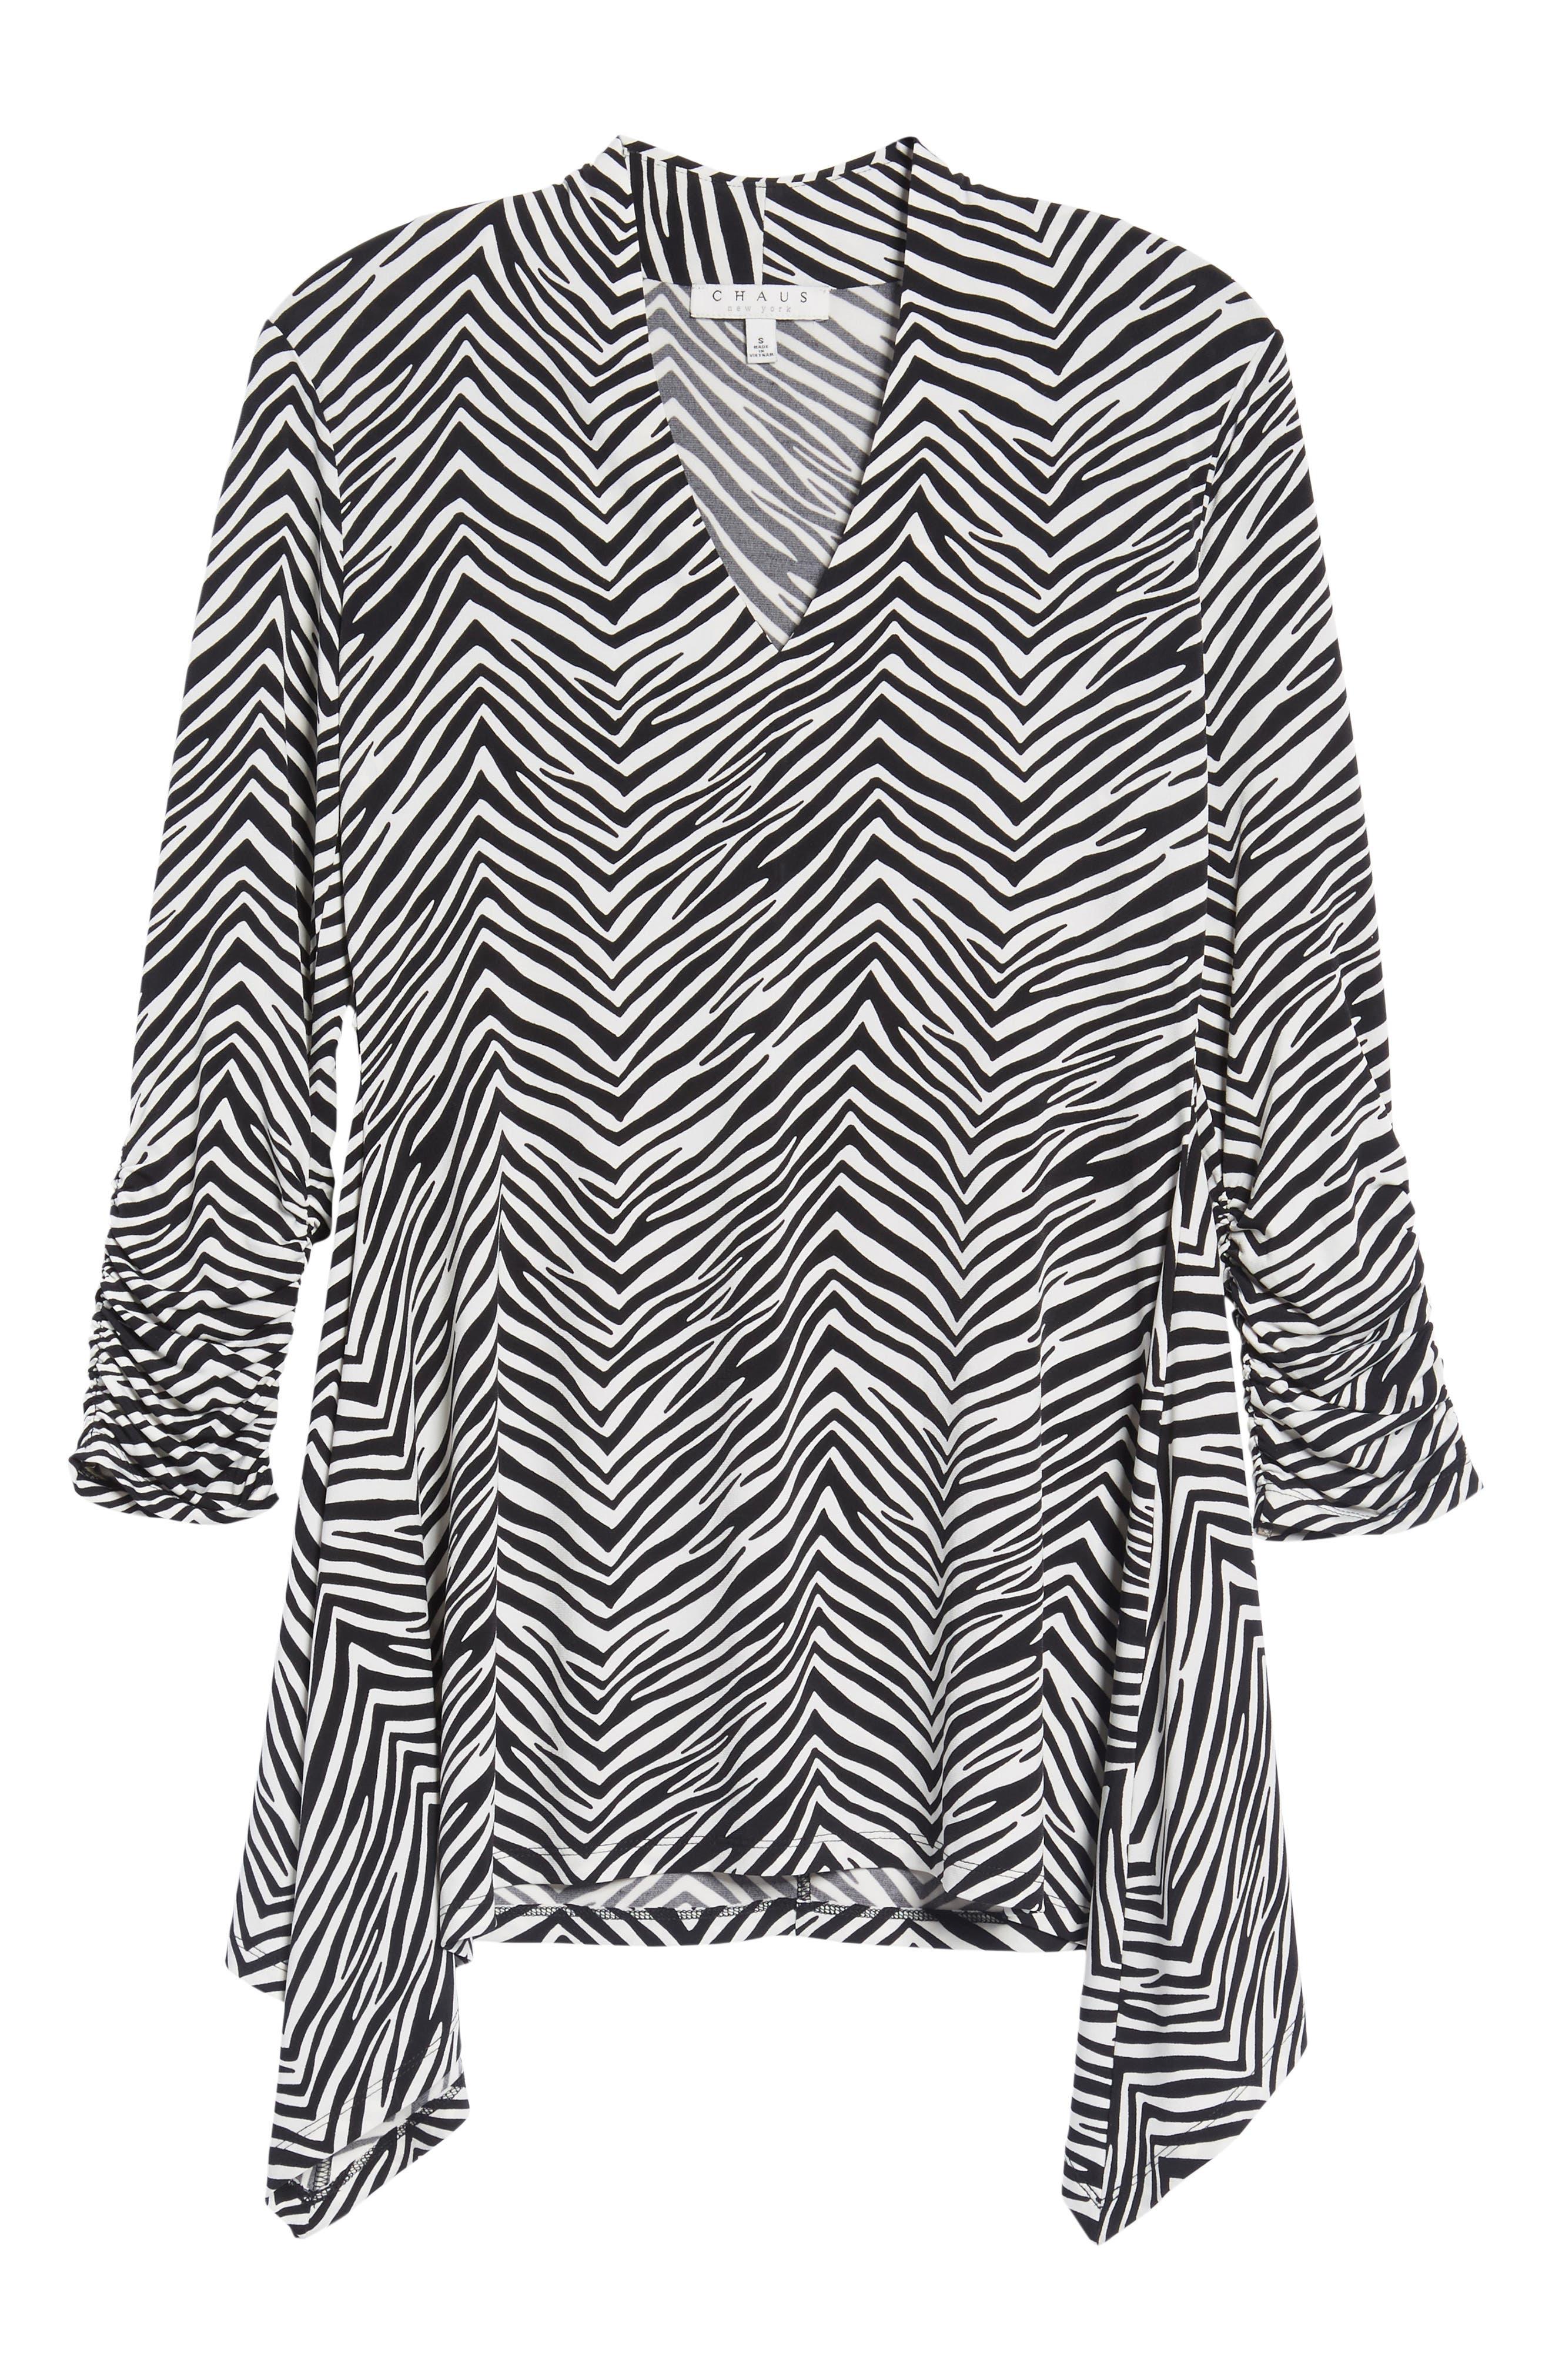 Zebra Print Ruched Top,                             Alternate thumbnail 6, color,                             010